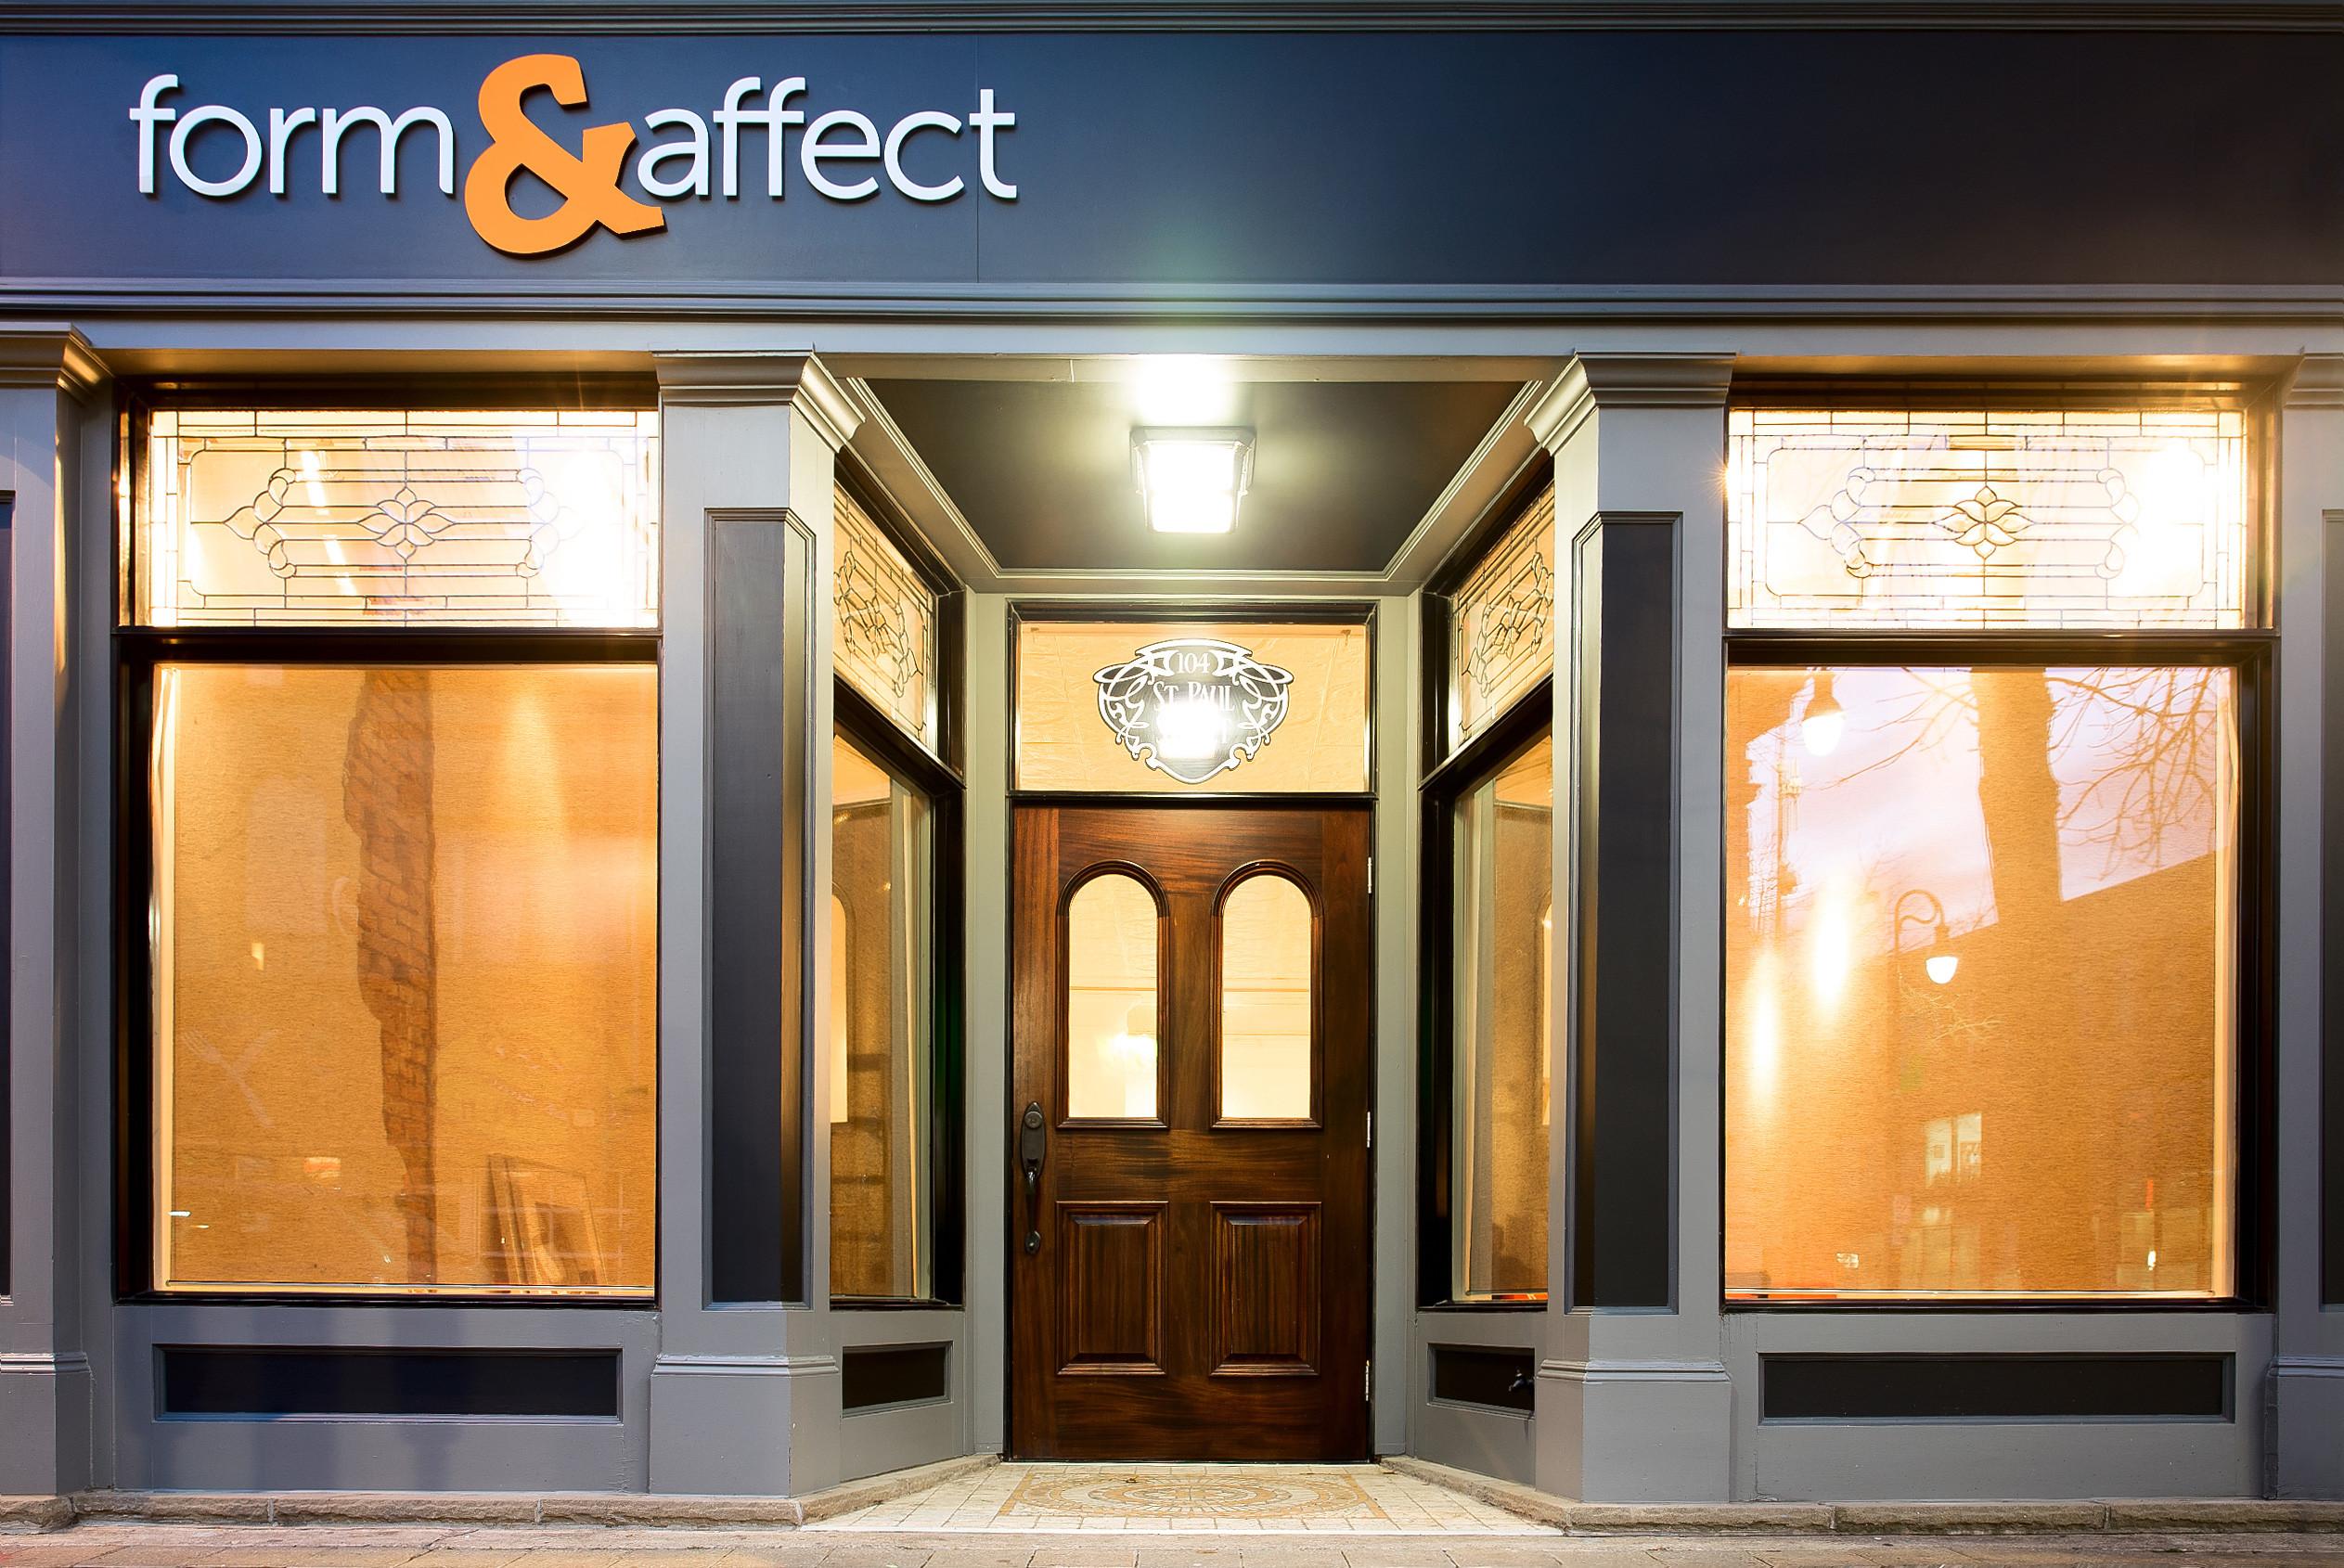 Form & Affect